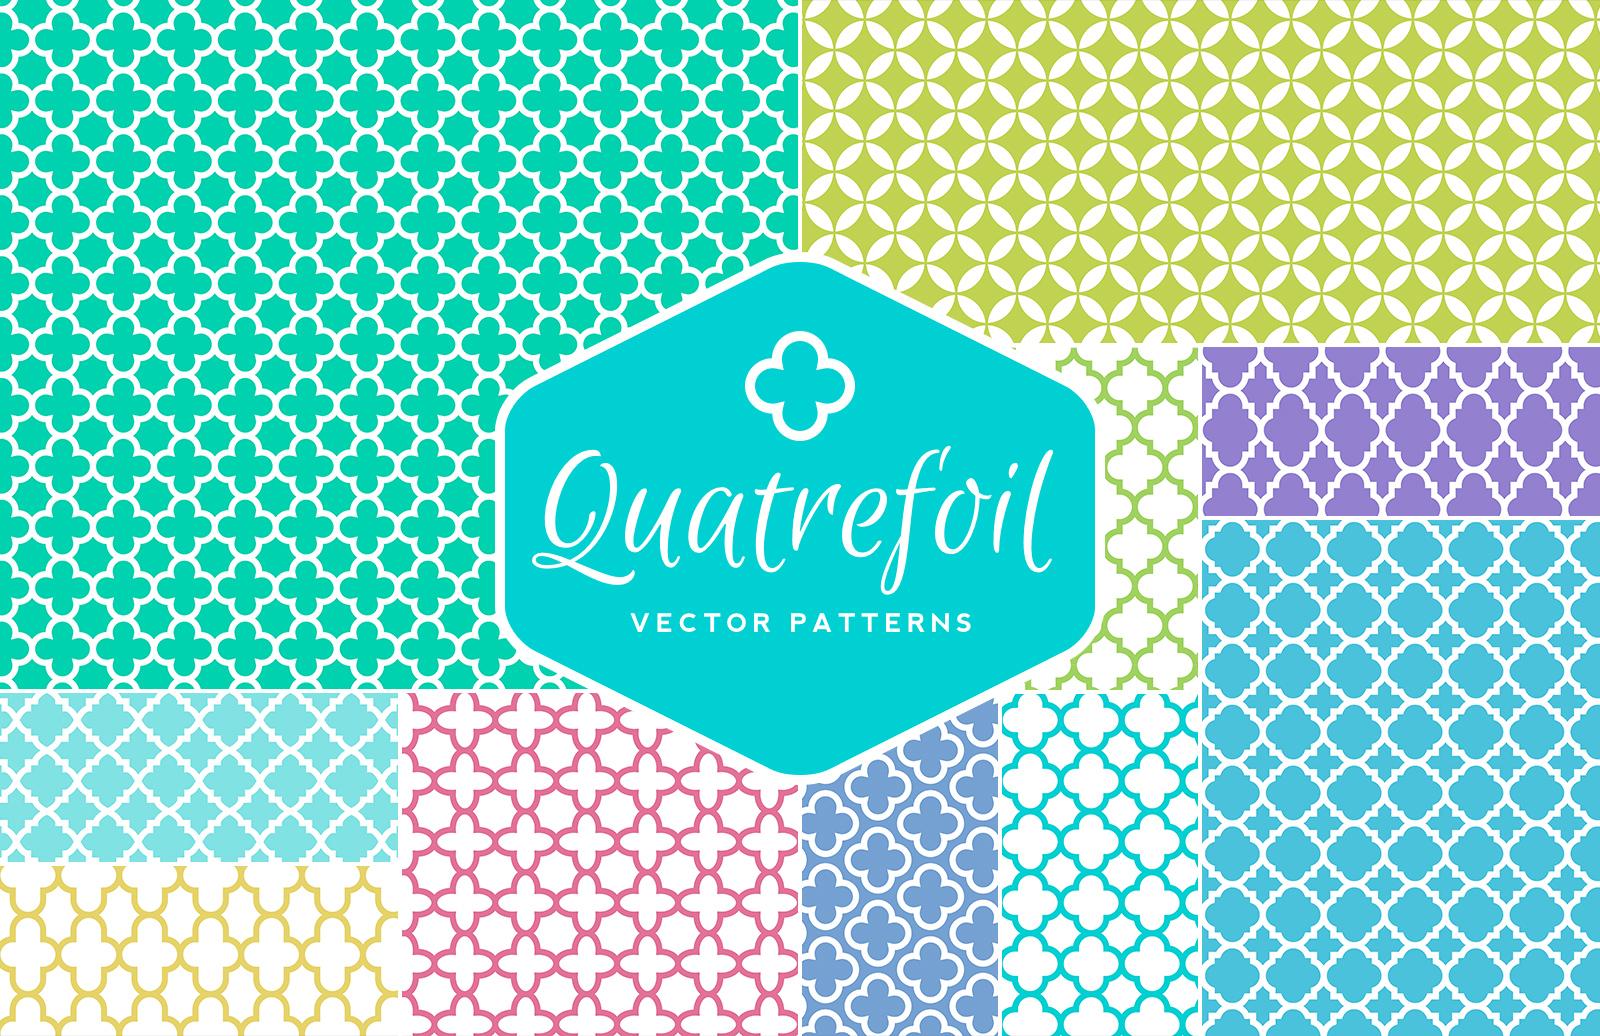 Seamless Vector Quatrefoil Patterns